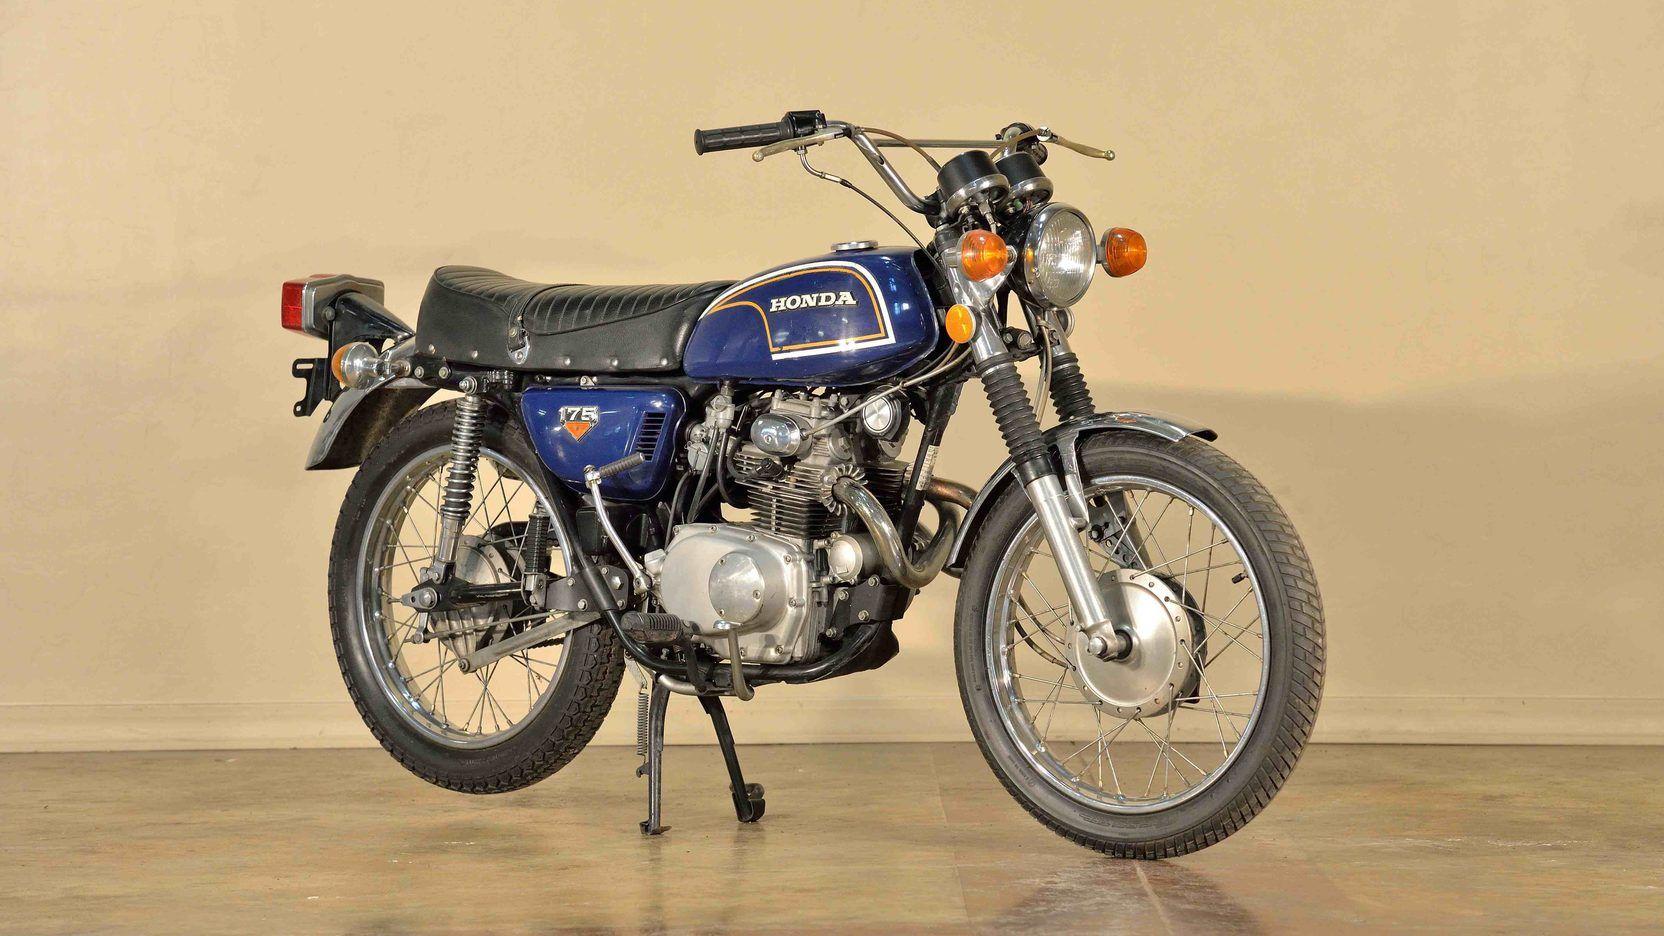 1972 Honda Cl175 Presented As Lot G51 At Las Vegas Nv Honda Vintage Motorcycles Mecum Auction [ 936 x 1664 Pixel ]